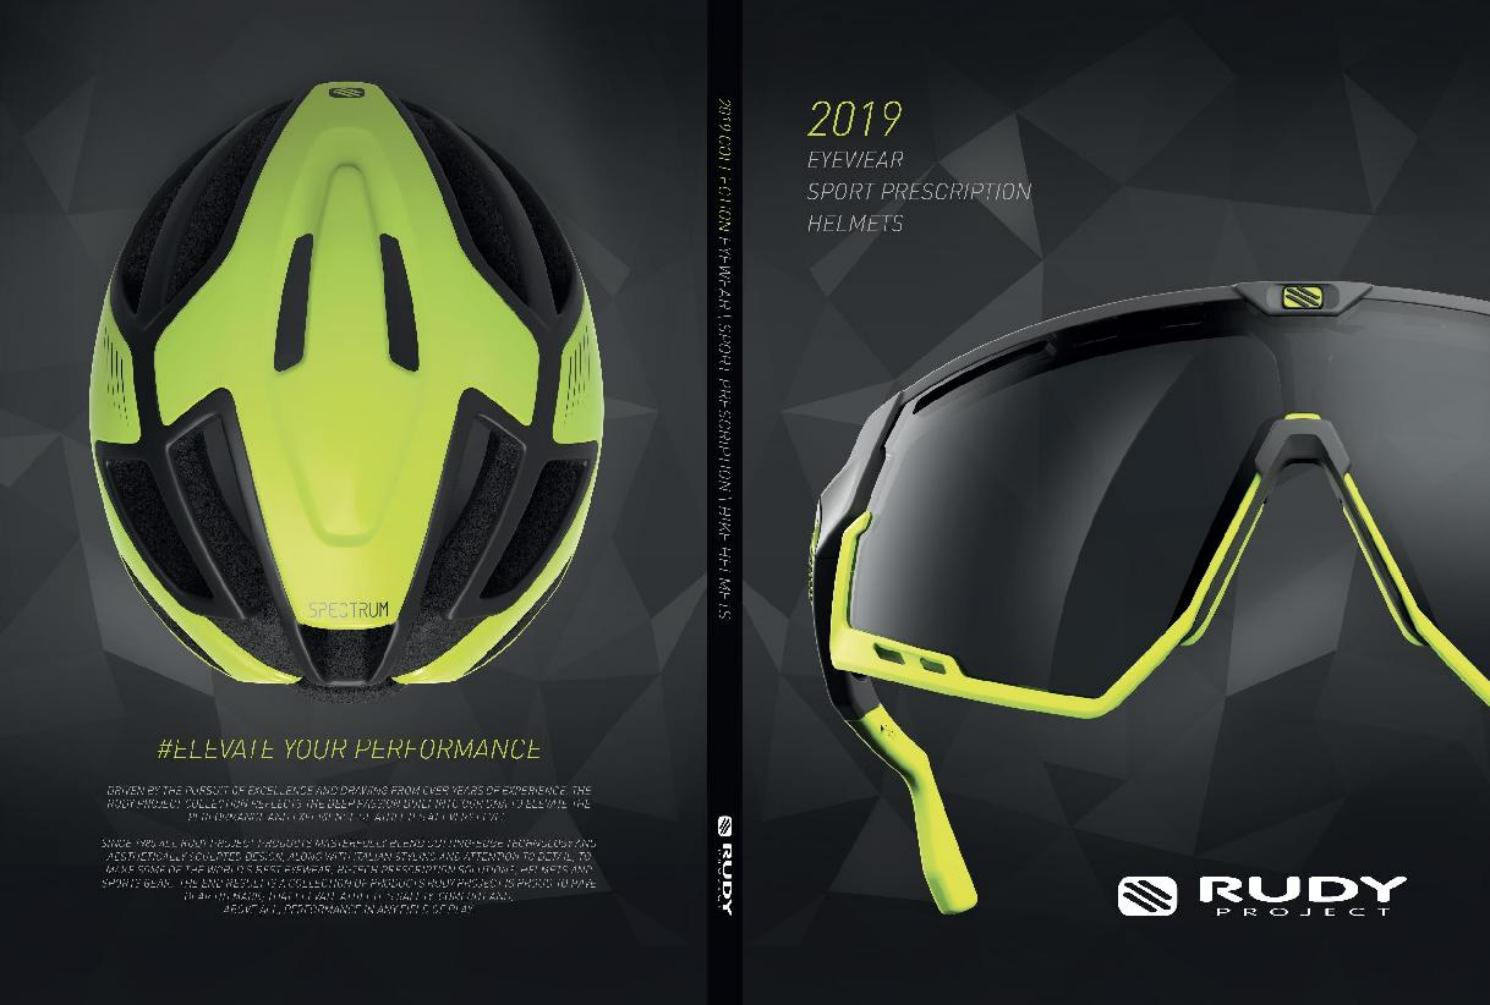 90d3dbd1b Rudy Project 2019 catalogue by Optiikka Juurinen Oy - issuu